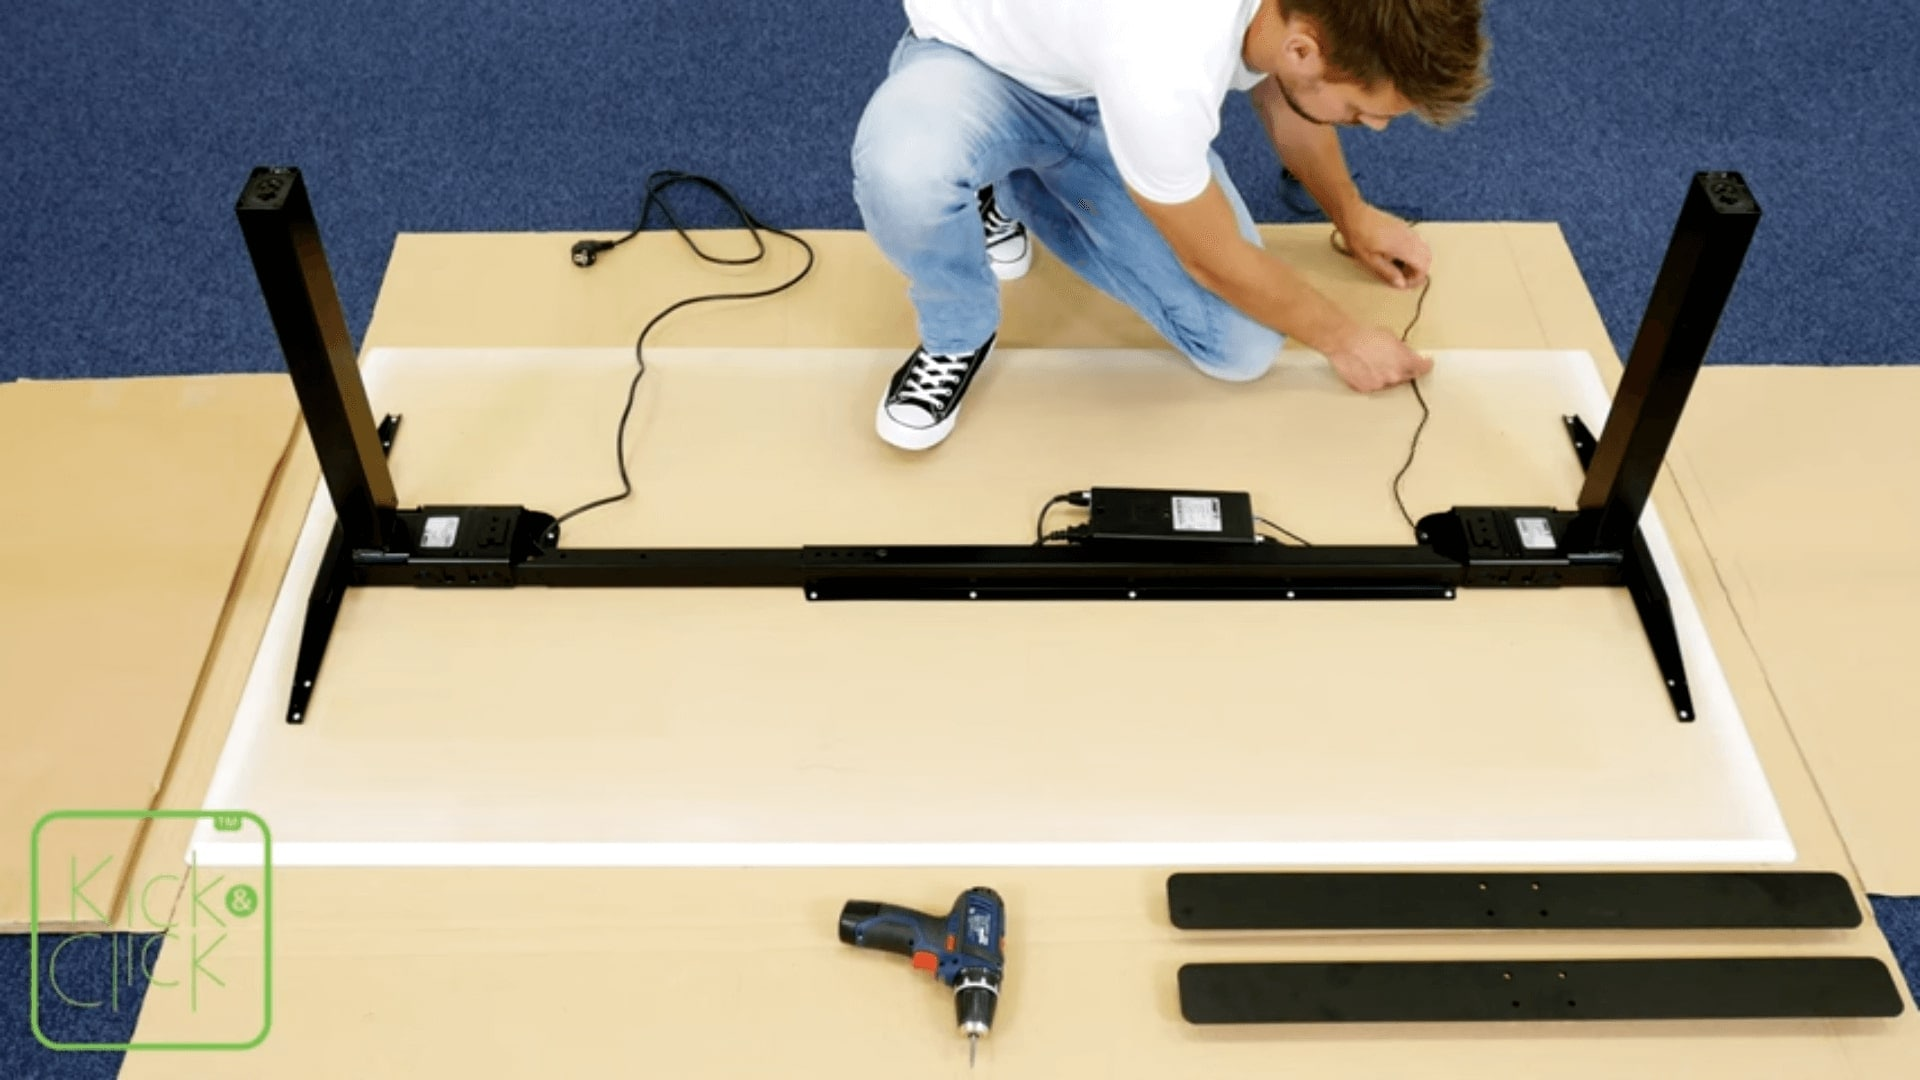 LINAK Kick & Click - 사무실 책상을 쉽게 조립하는 방법